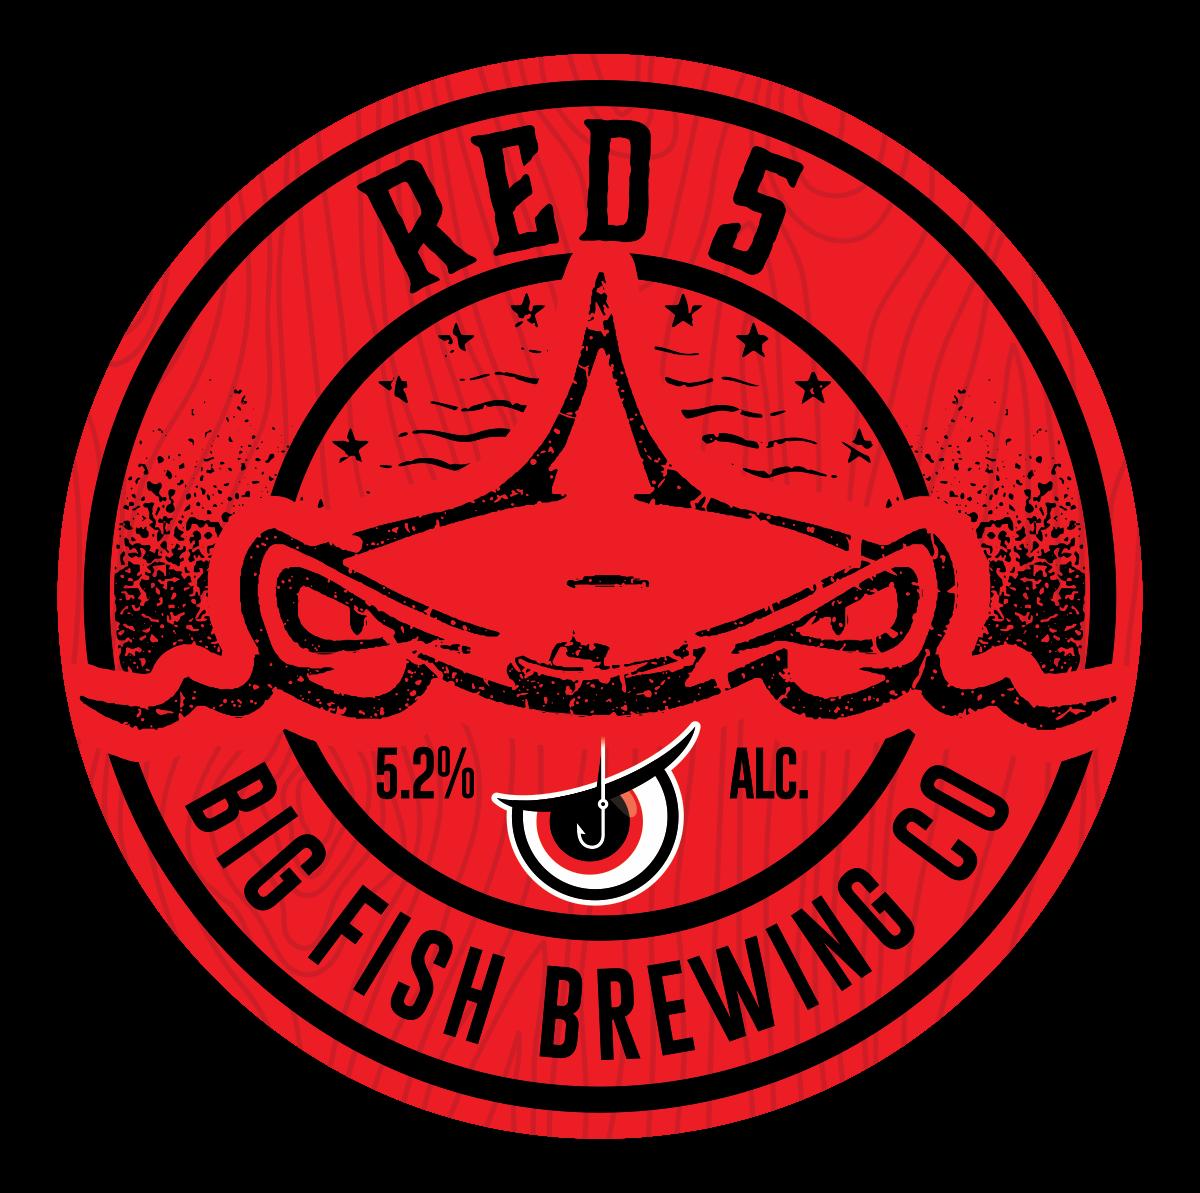 Beer pump clip - Red 5